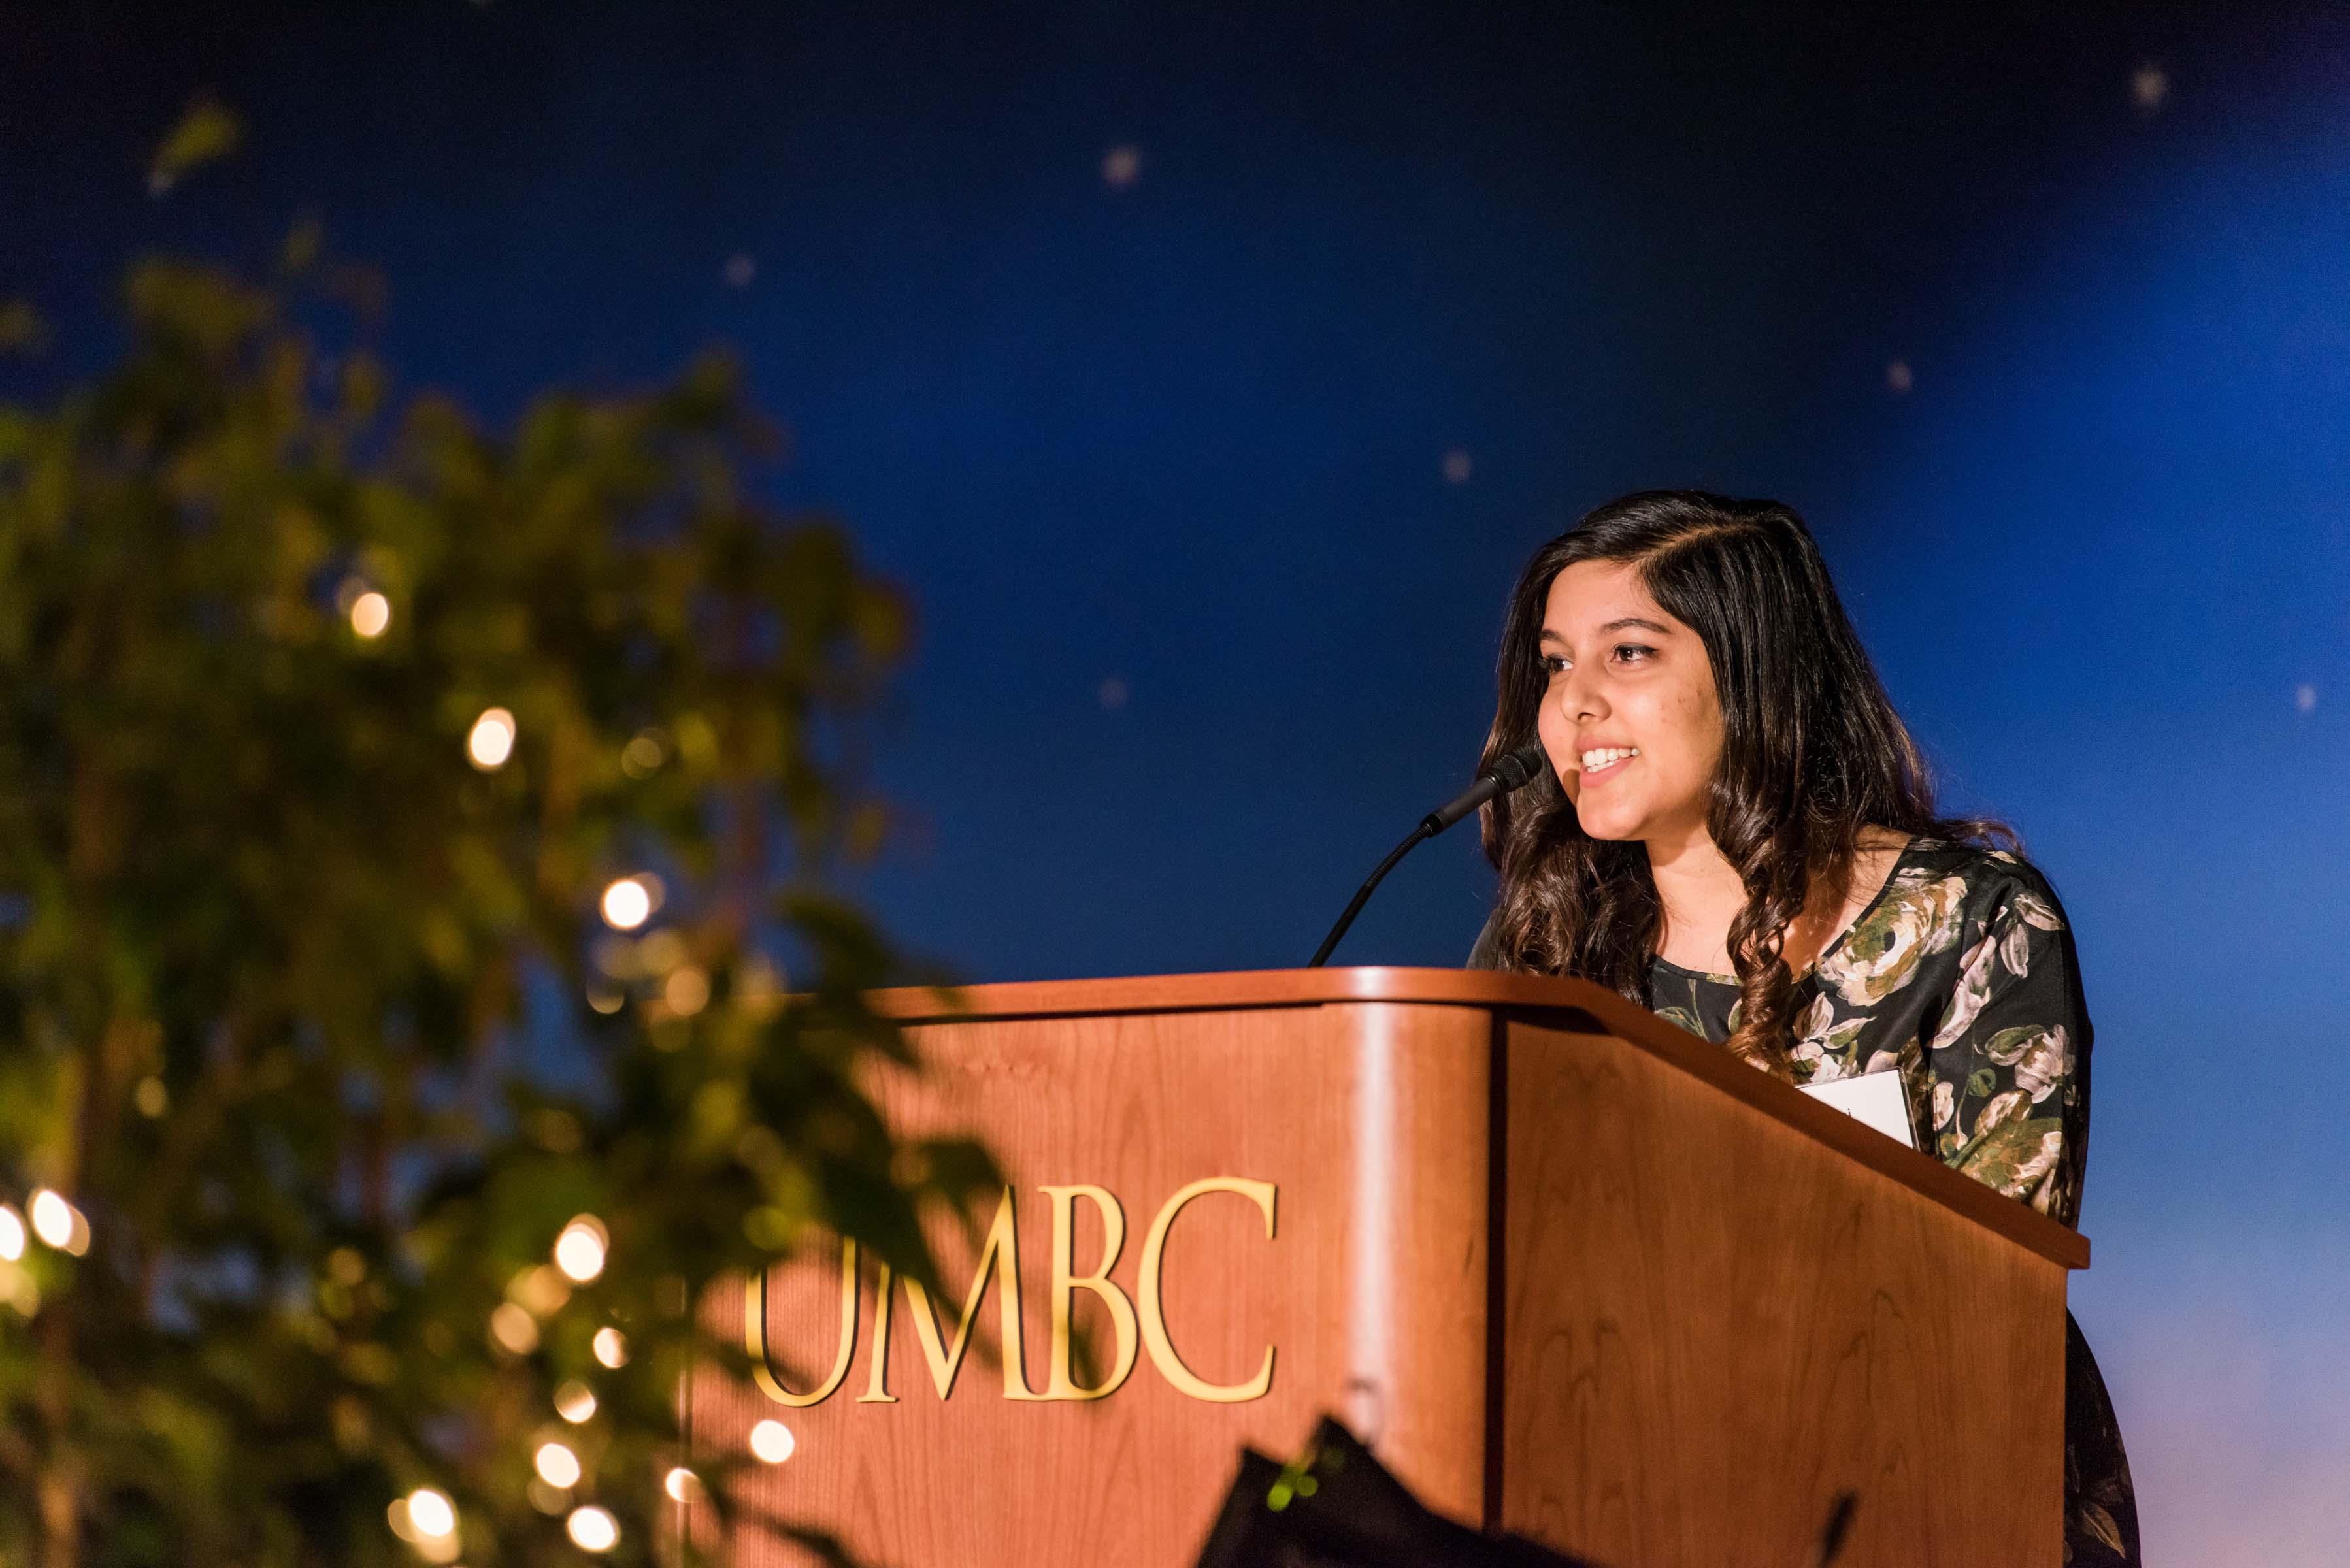 Poulomi Banerjee gives talk behind UMBC podium at 2018 wine tasting